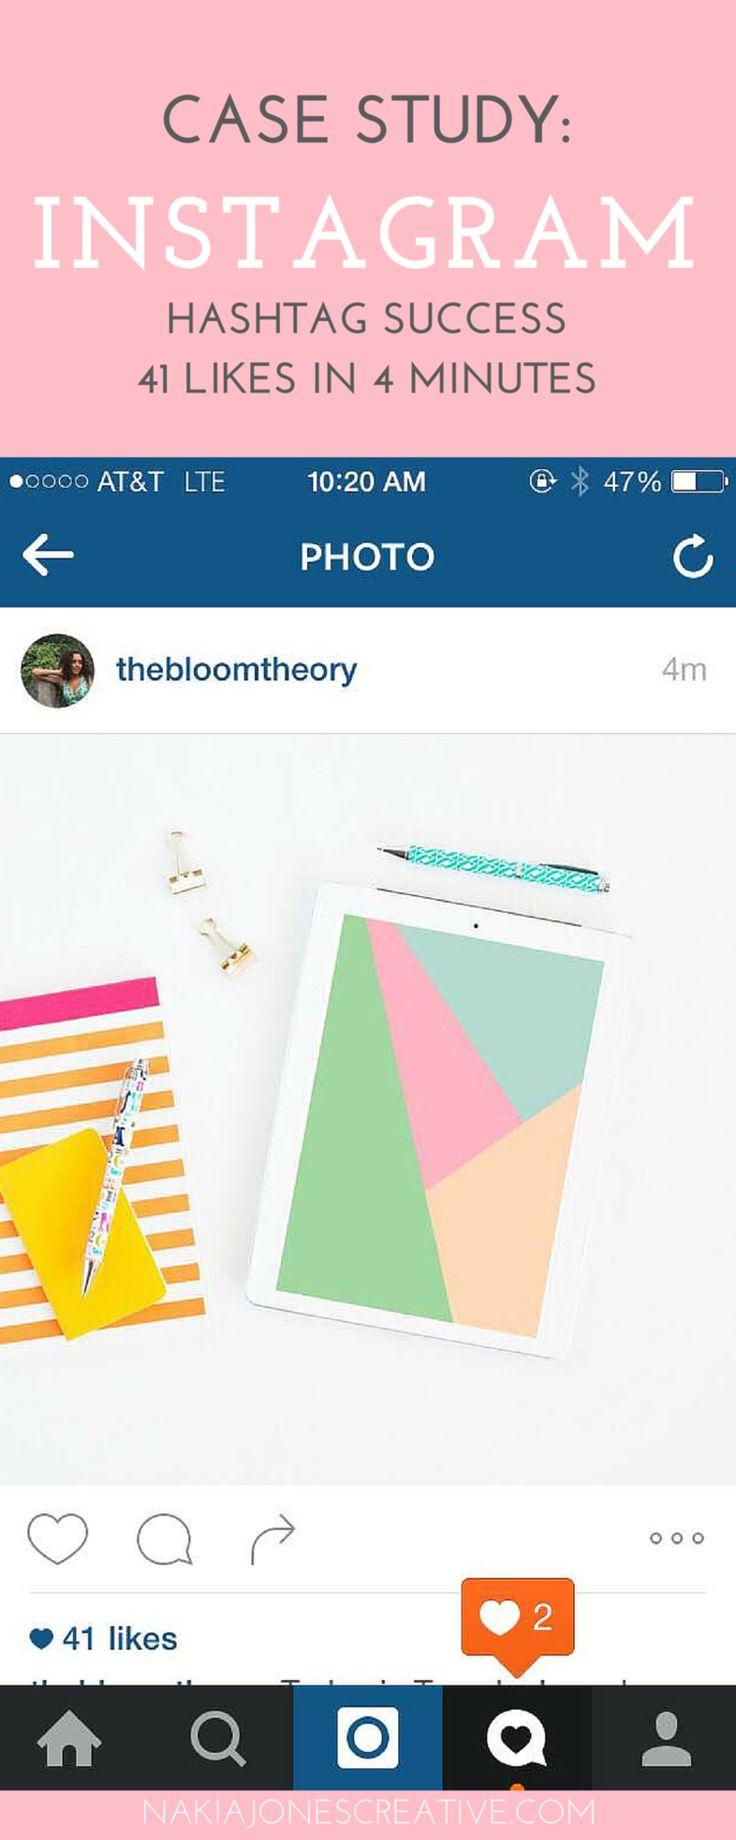 Case Study: Instagram Hashtag Success - 41 likes in 4 minutes - Nakia Jones…